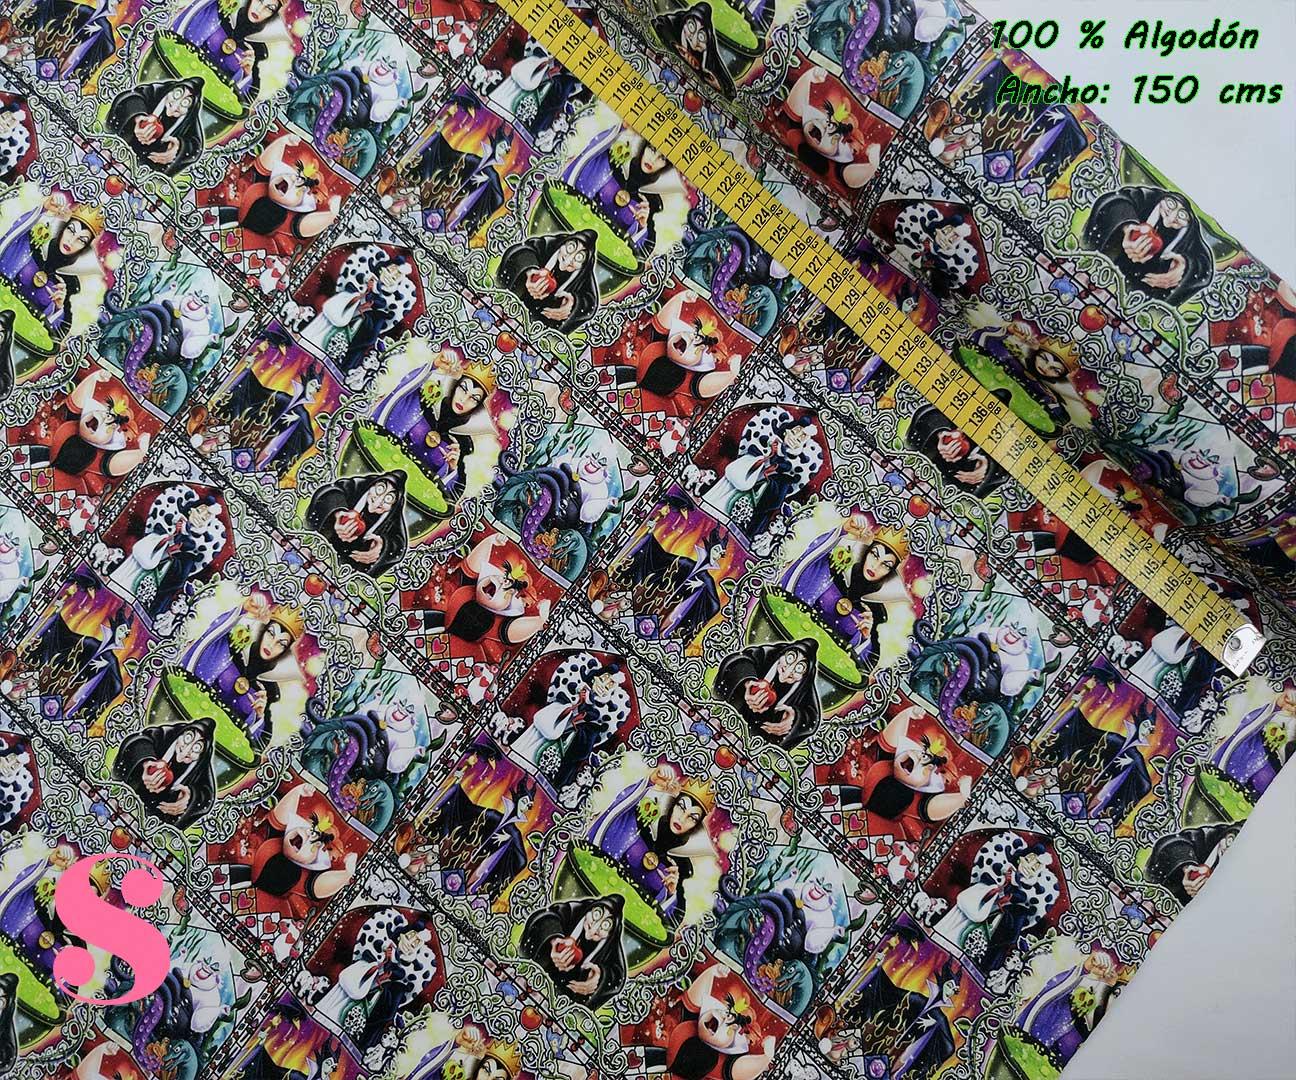 tejidos-estampados-de-algodón,-telas-frikis,telas-estampadas-de-moda,Tejido Estampado Vidriera Villanas Disney